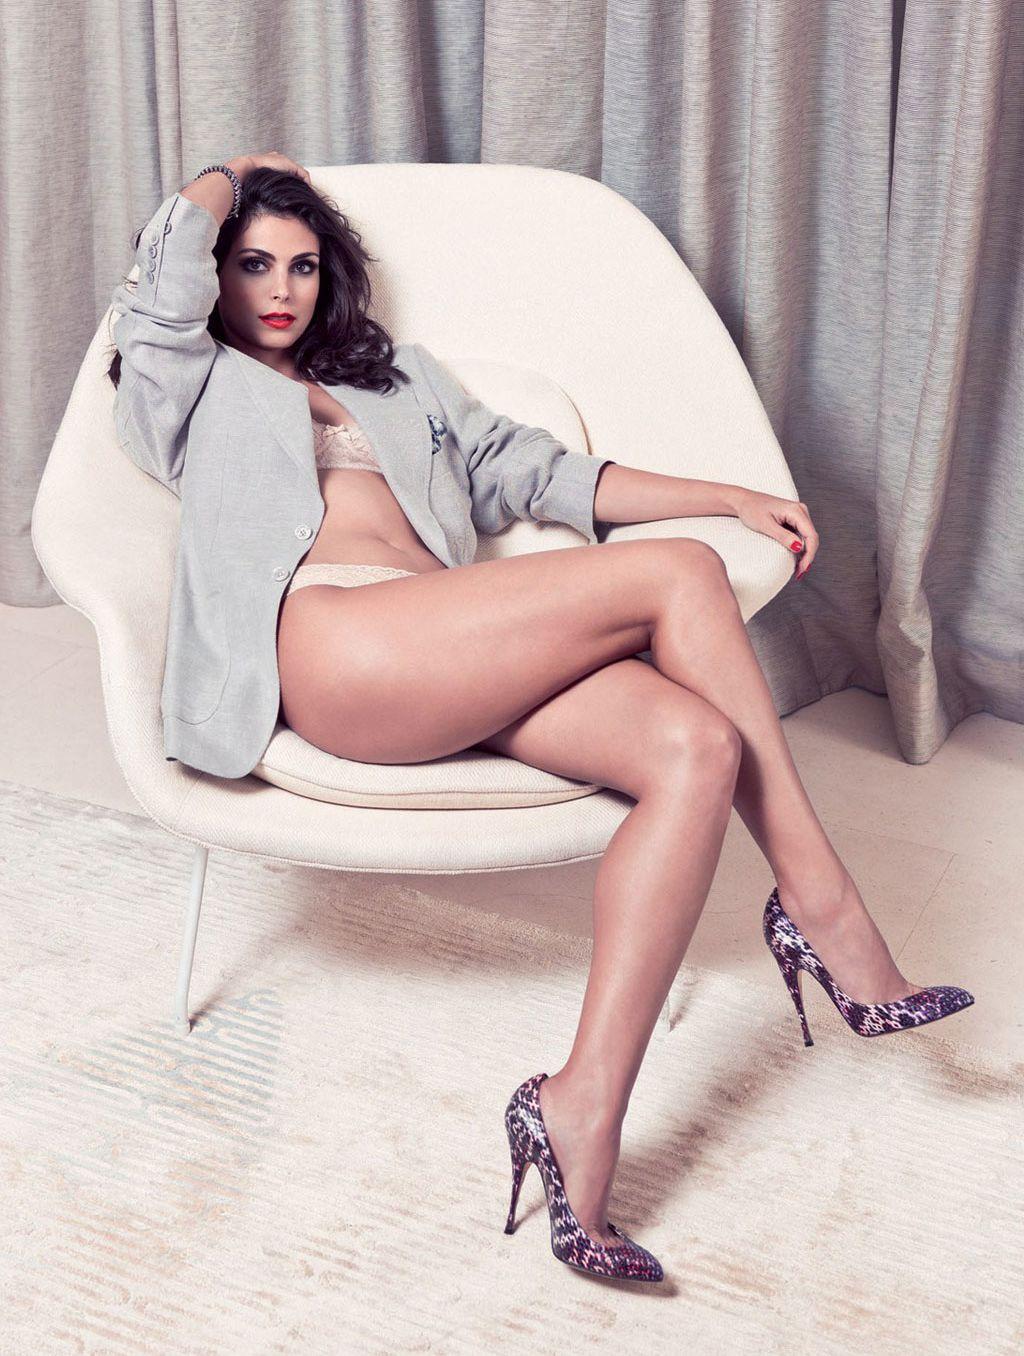 Legs morena baccarin Celebrity Legs